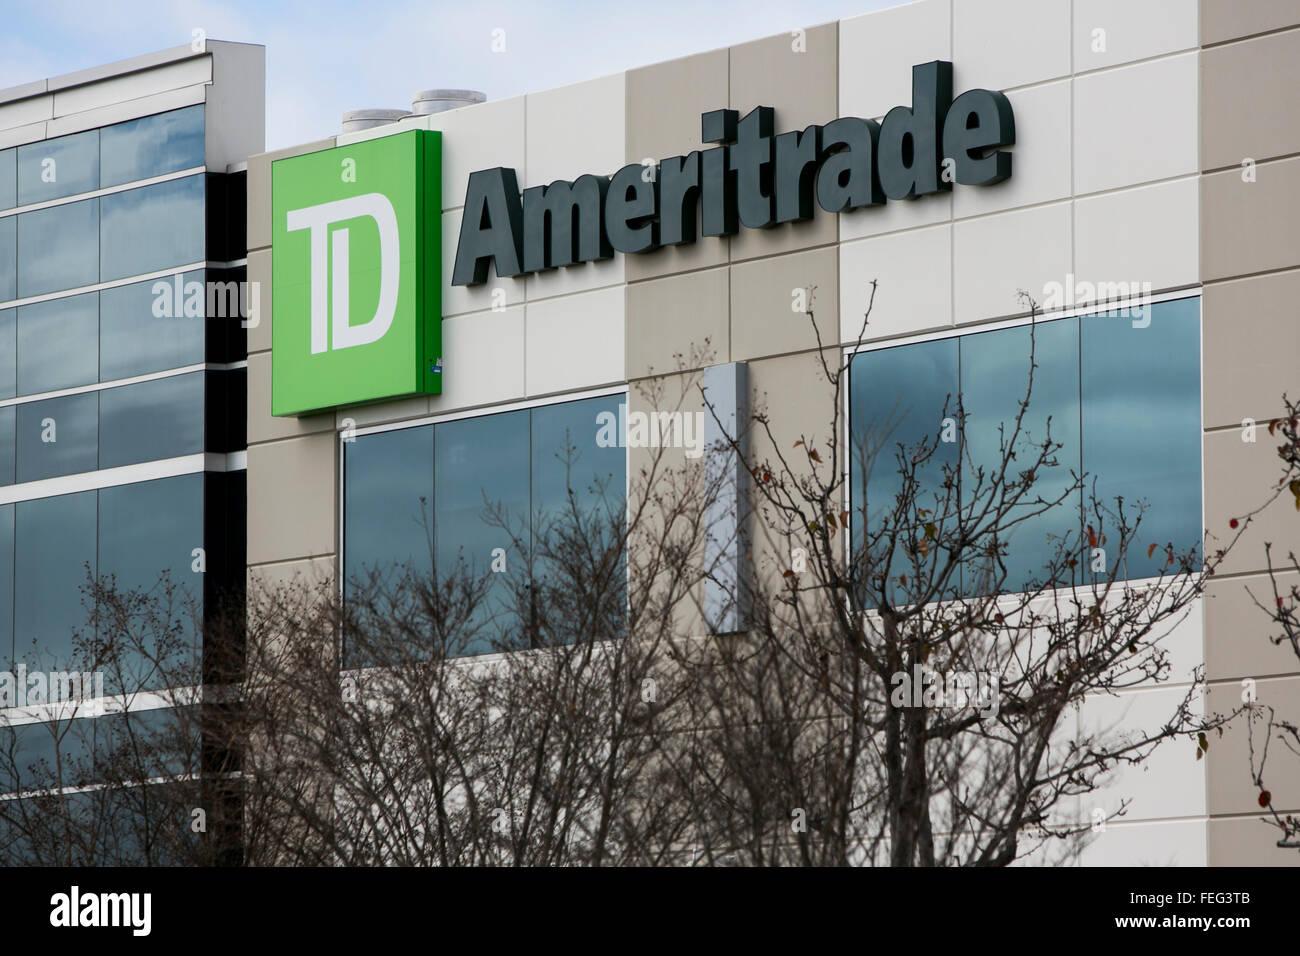 Td Ameritrade Stock Photos & Td Ameritrade Stock Images - Alamy